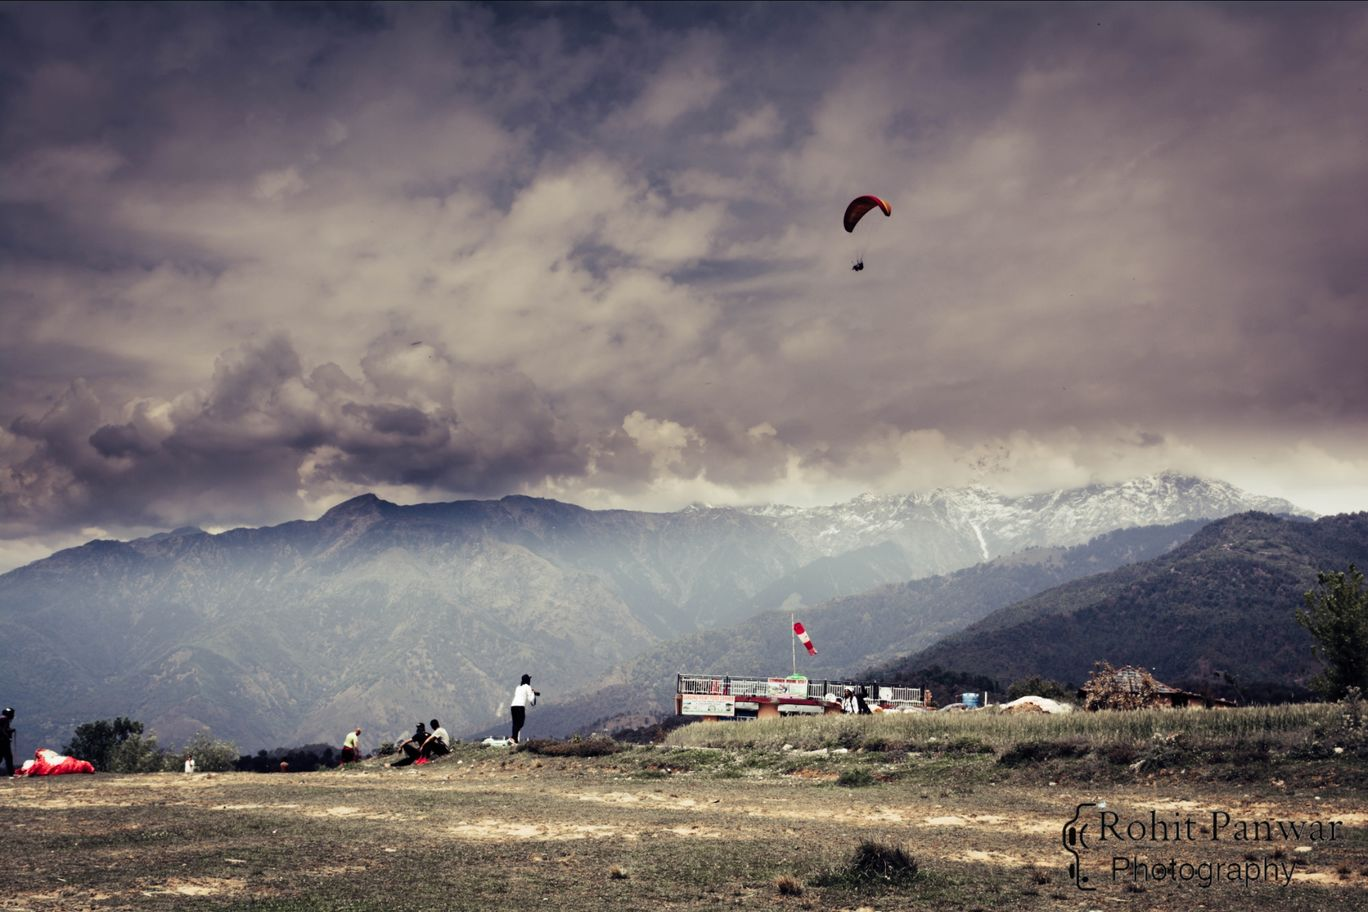 Photo of Bir By Rohit Panwar